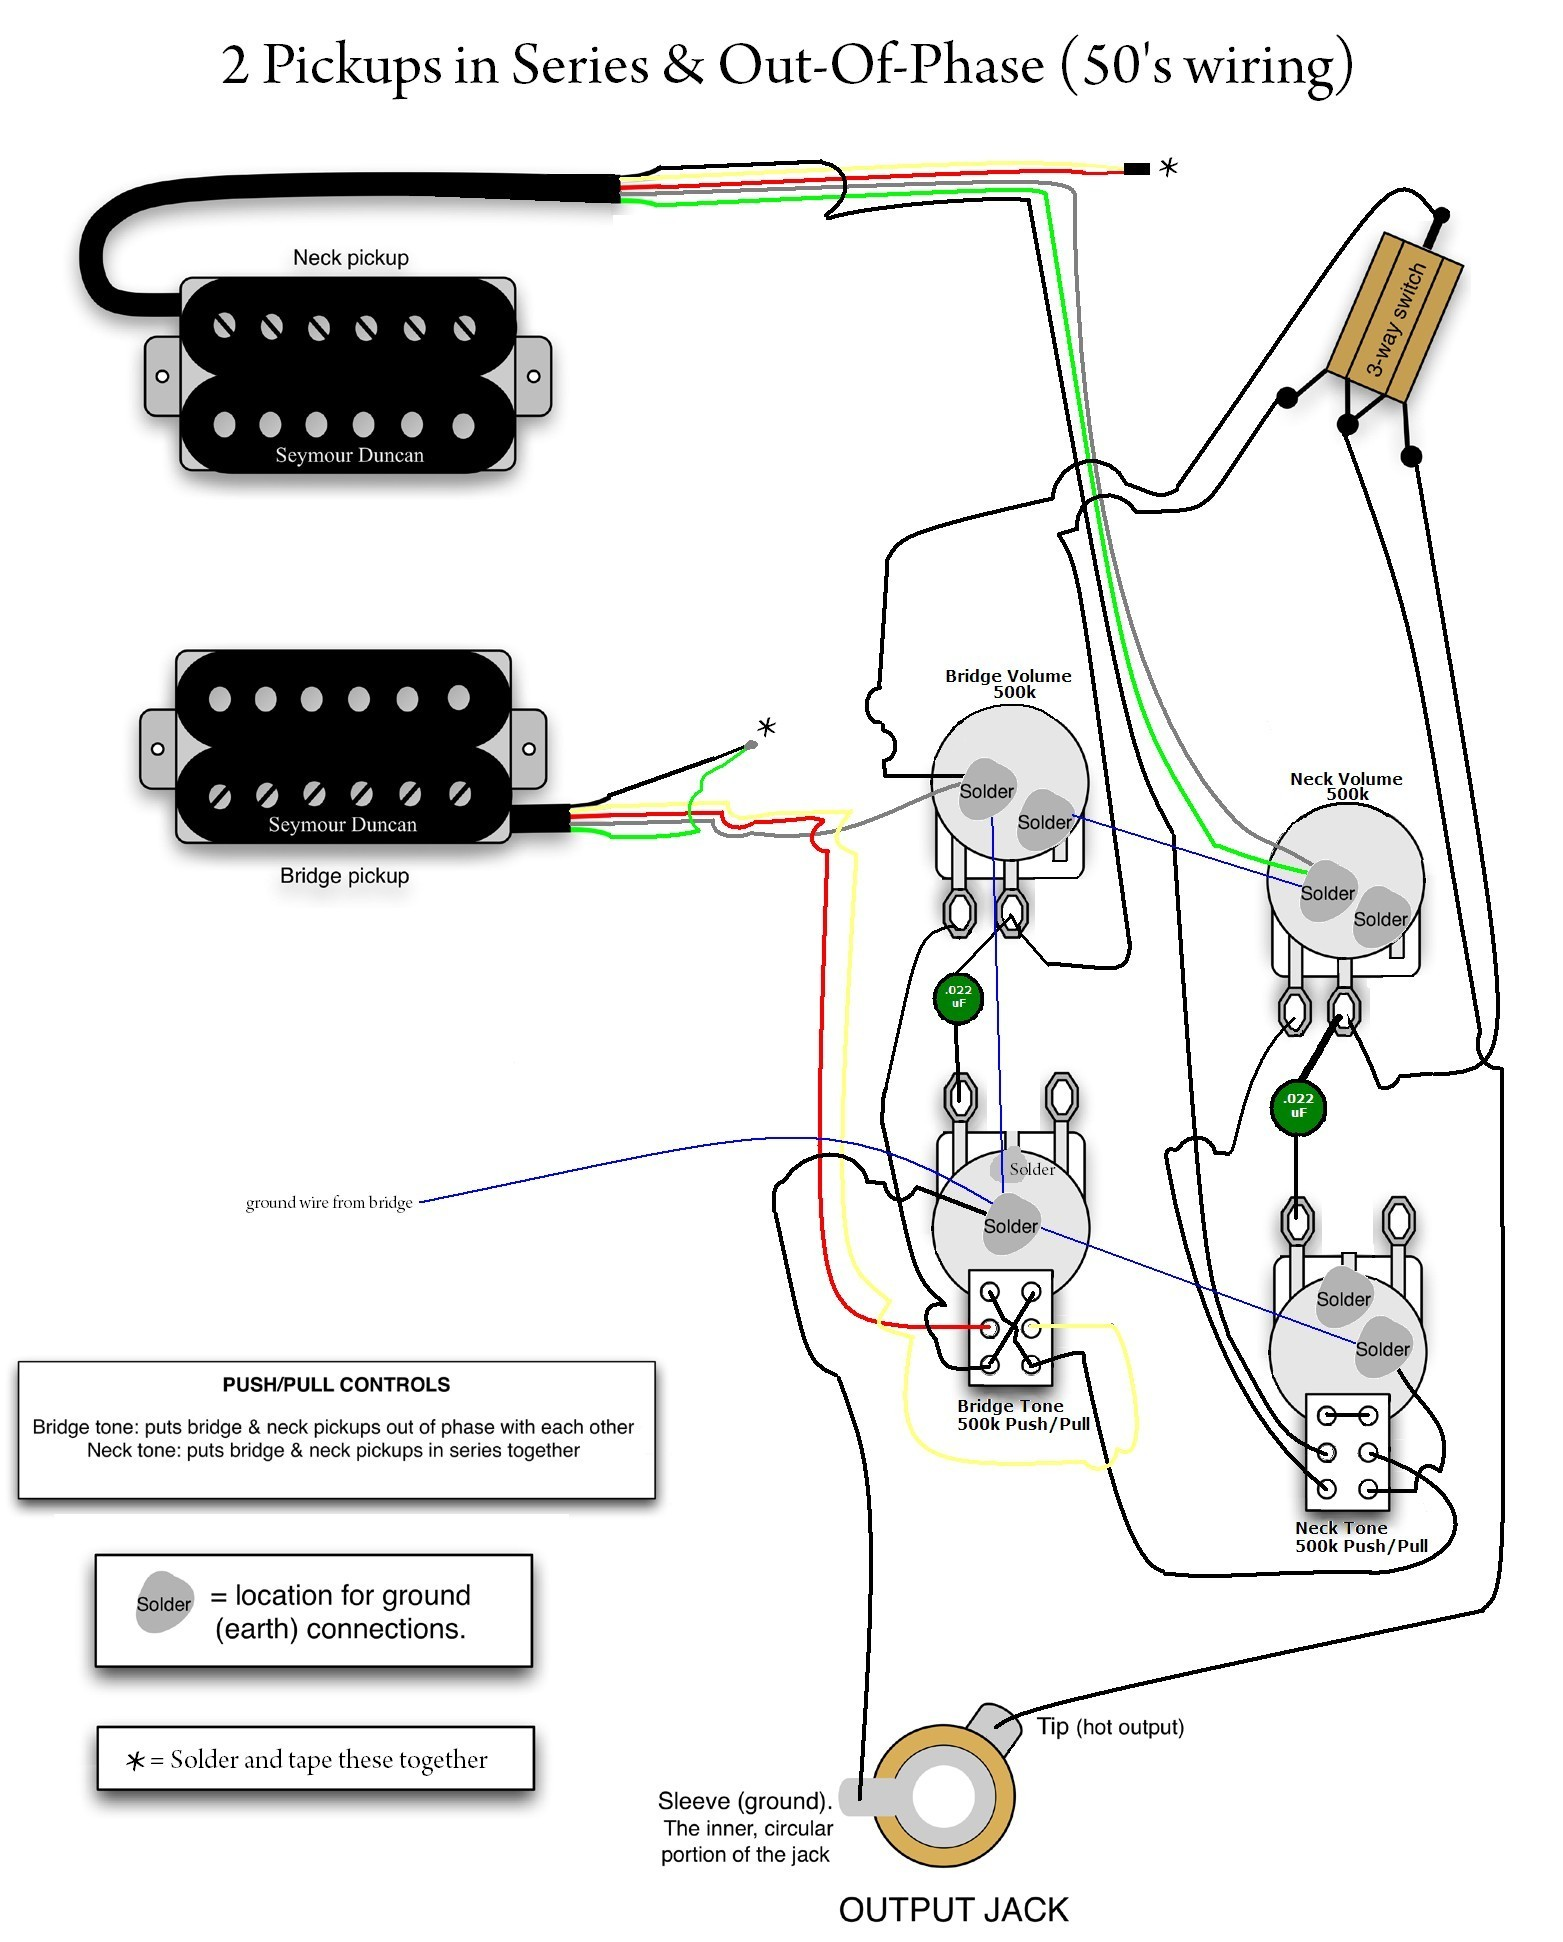 les paul jr wiring diagram wiring diagram rh 3 fomly be